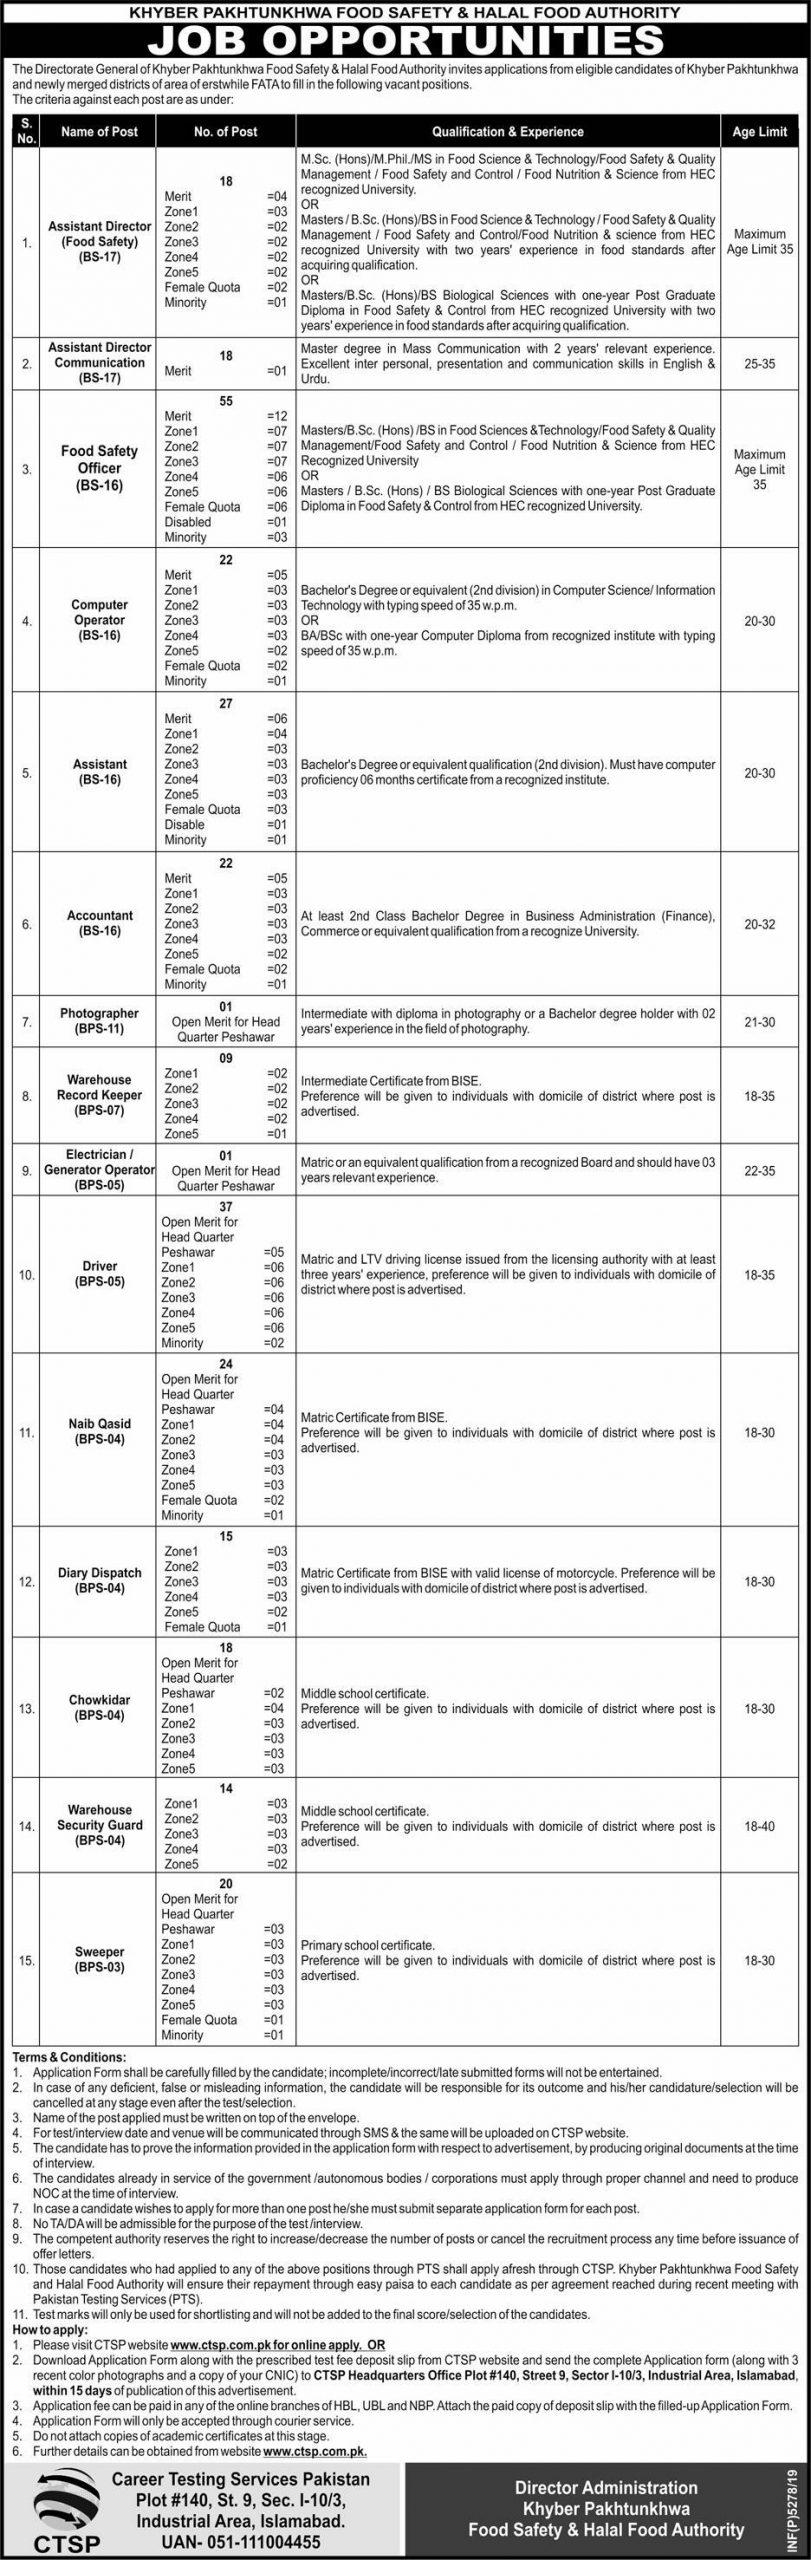 KPK Food Safety Halal Food Authority Jobs CTSP Answer Keys Result Merit List